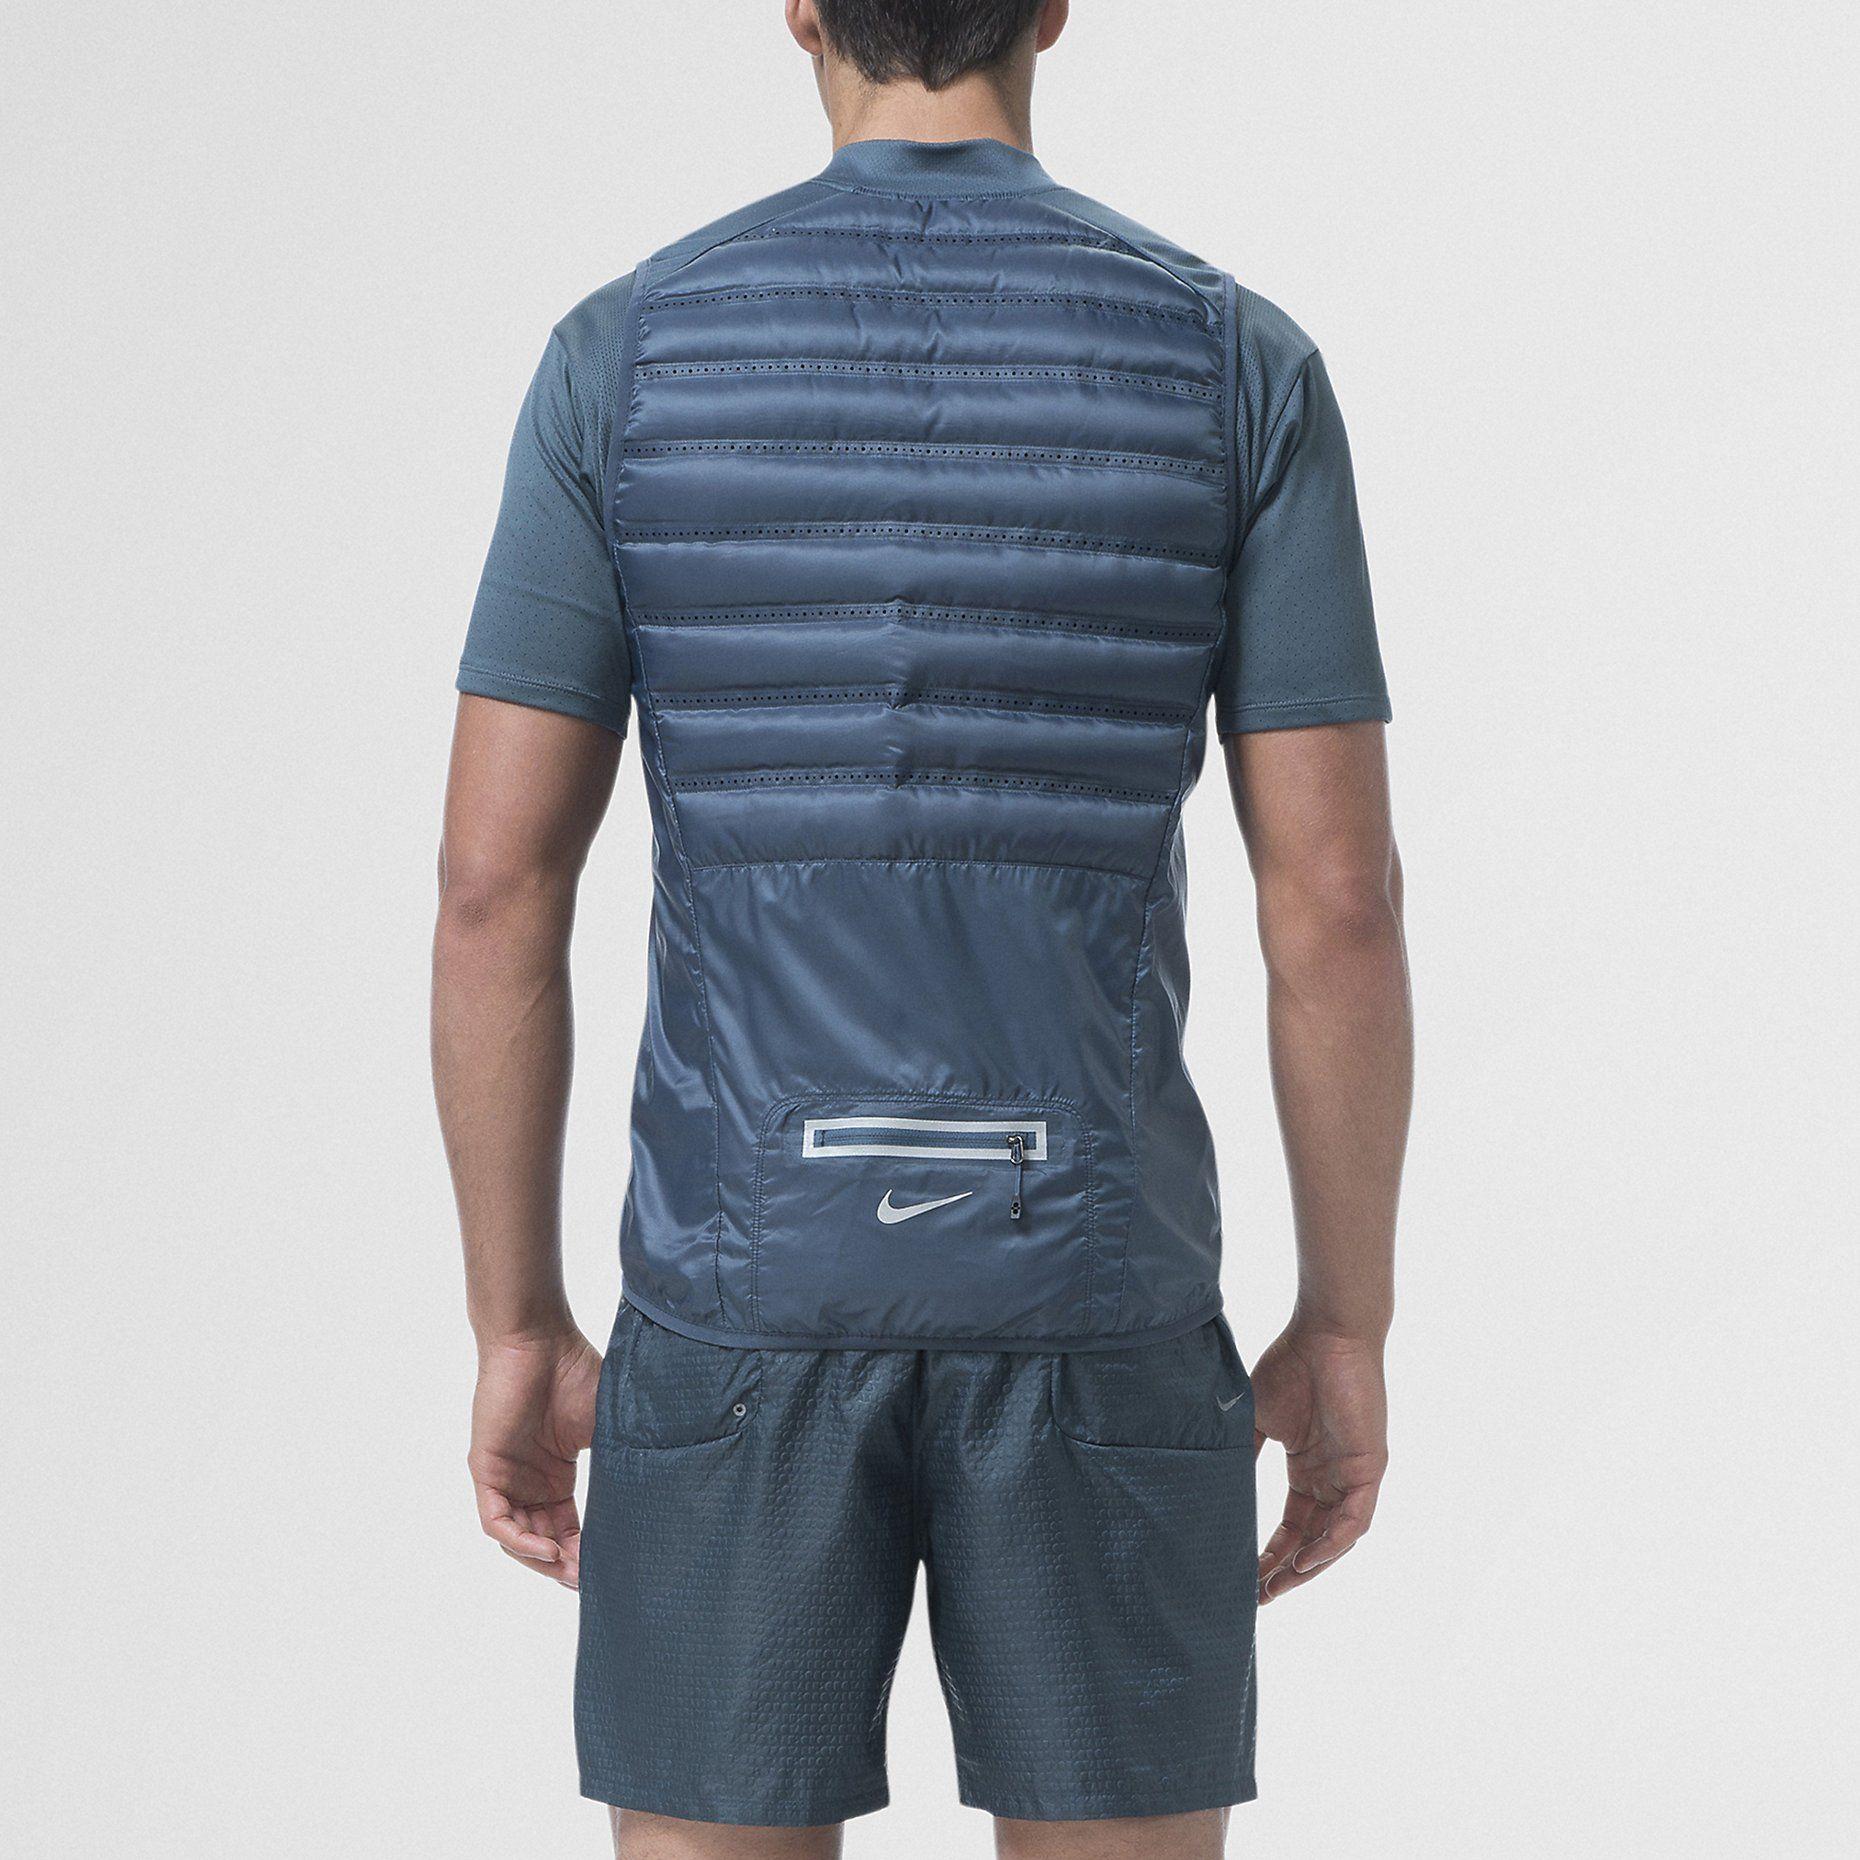 nike x undercover gyakusou aeroloft 800 veste de running pour homme nike store fr running. Black Bedroom Furniture Sets. Home Design Ideas